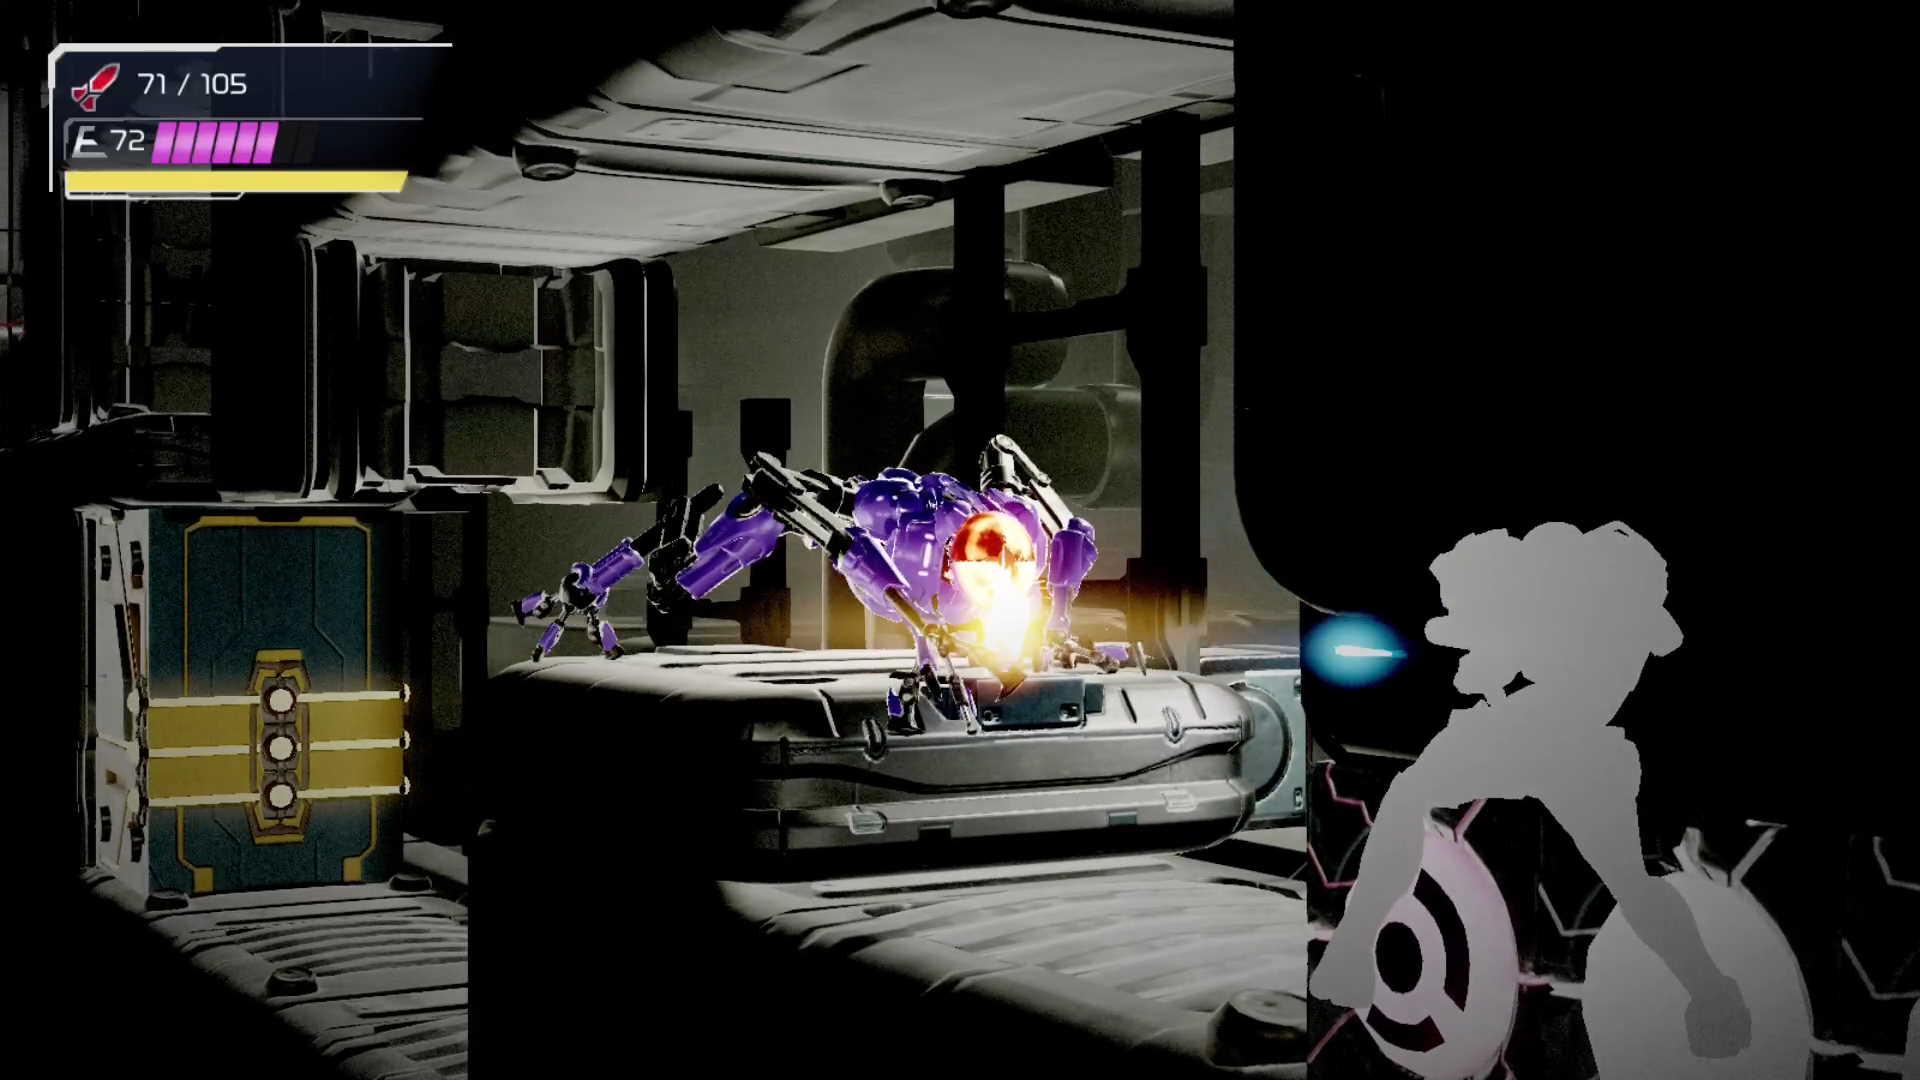 Metroid Dread: Purple EMMI attack